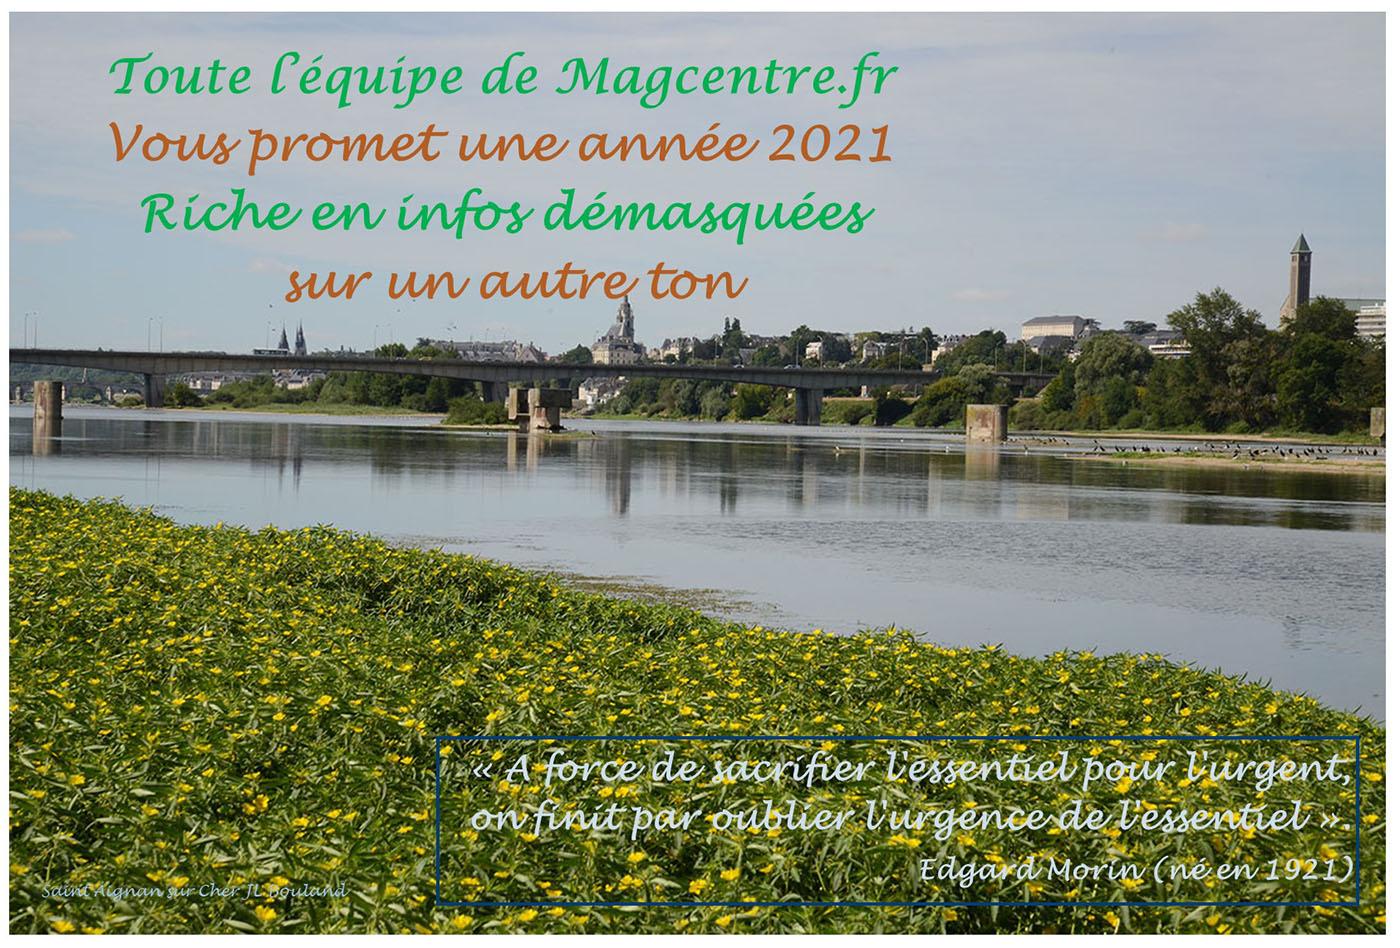 MagCentre